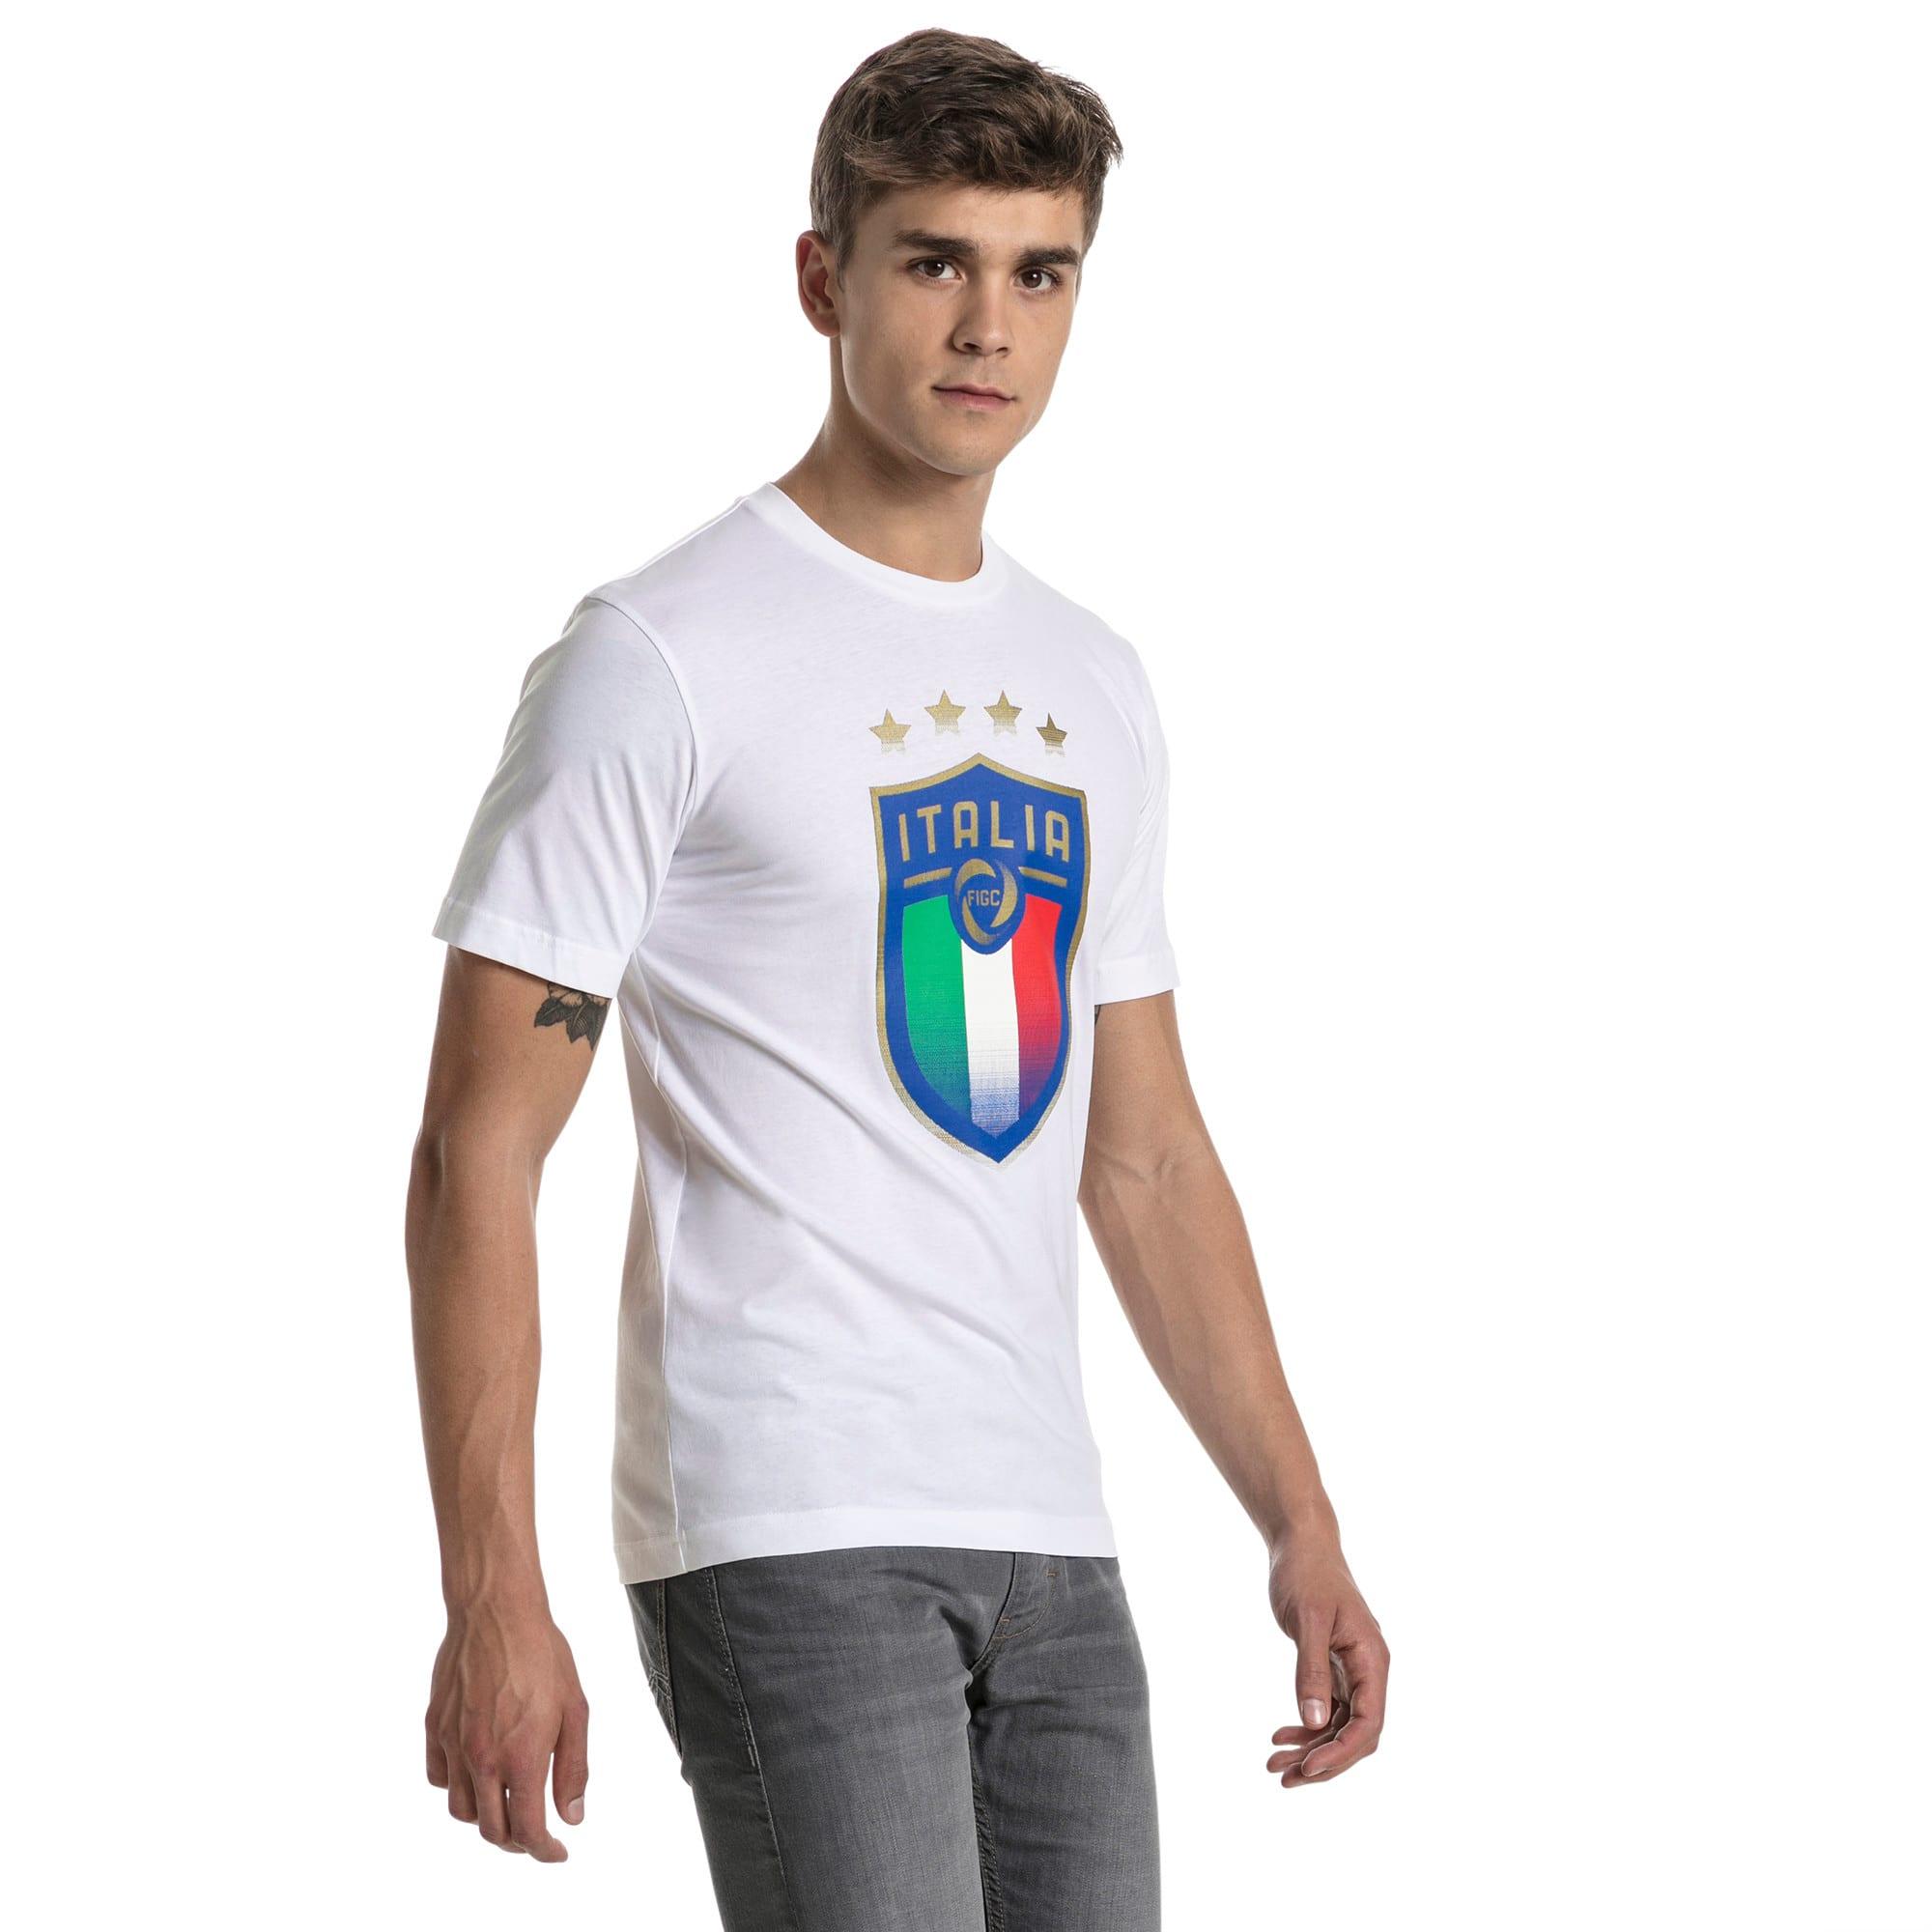 Thumbnail 2 of Italia Badge Tee, Puma White, medium